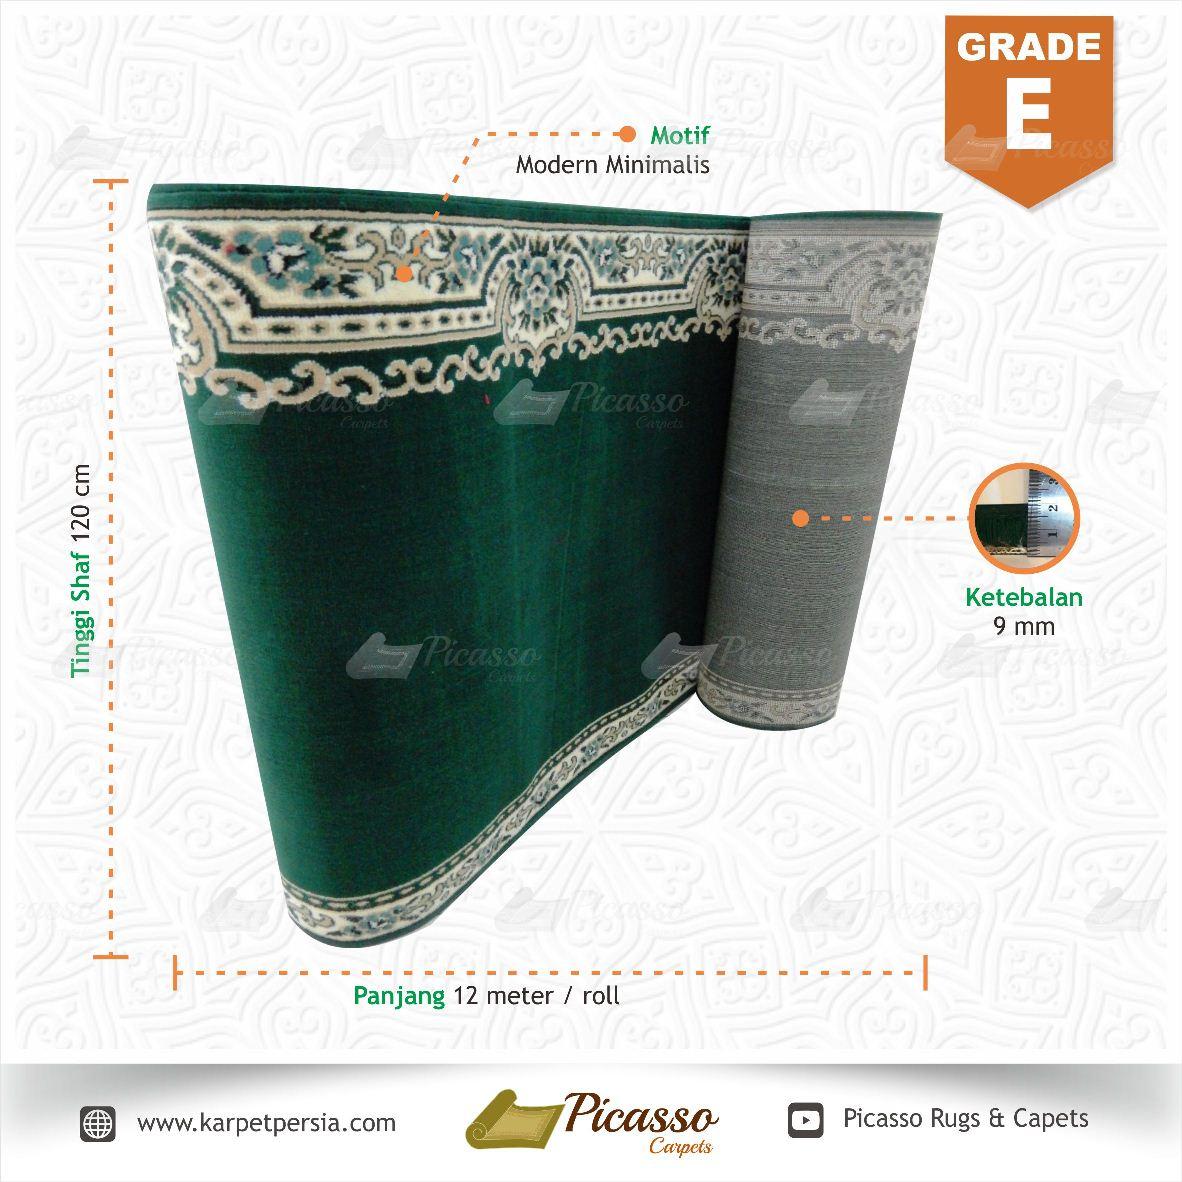 Karpet Masjid - Grade E